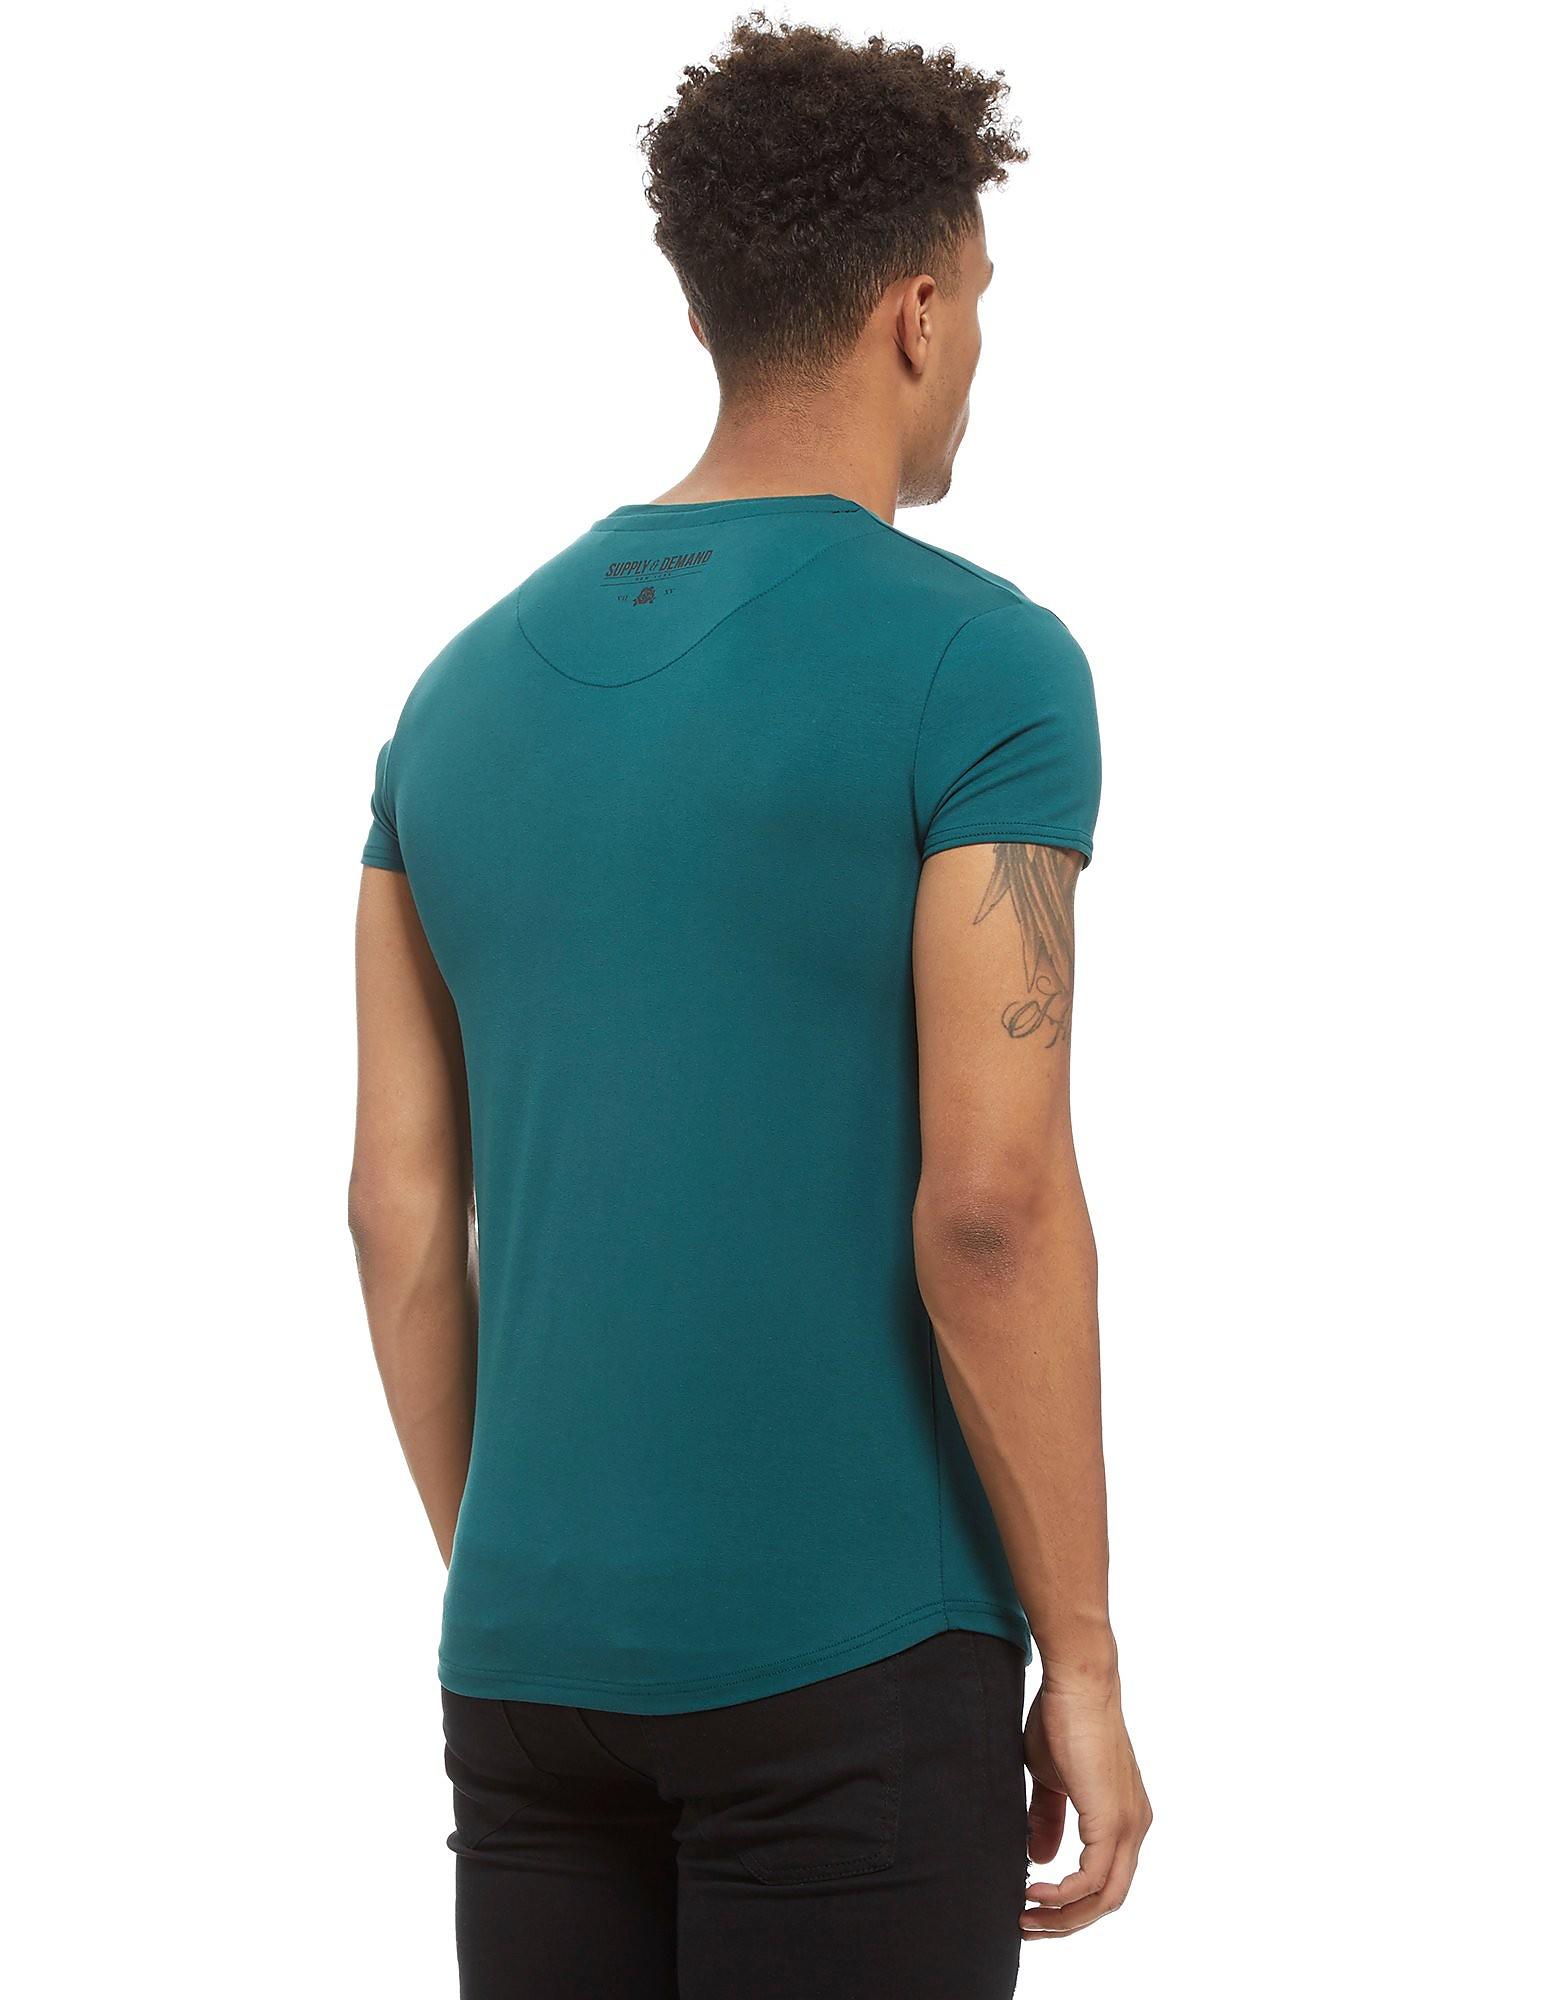 Supply & Demand Reps T-Shirt